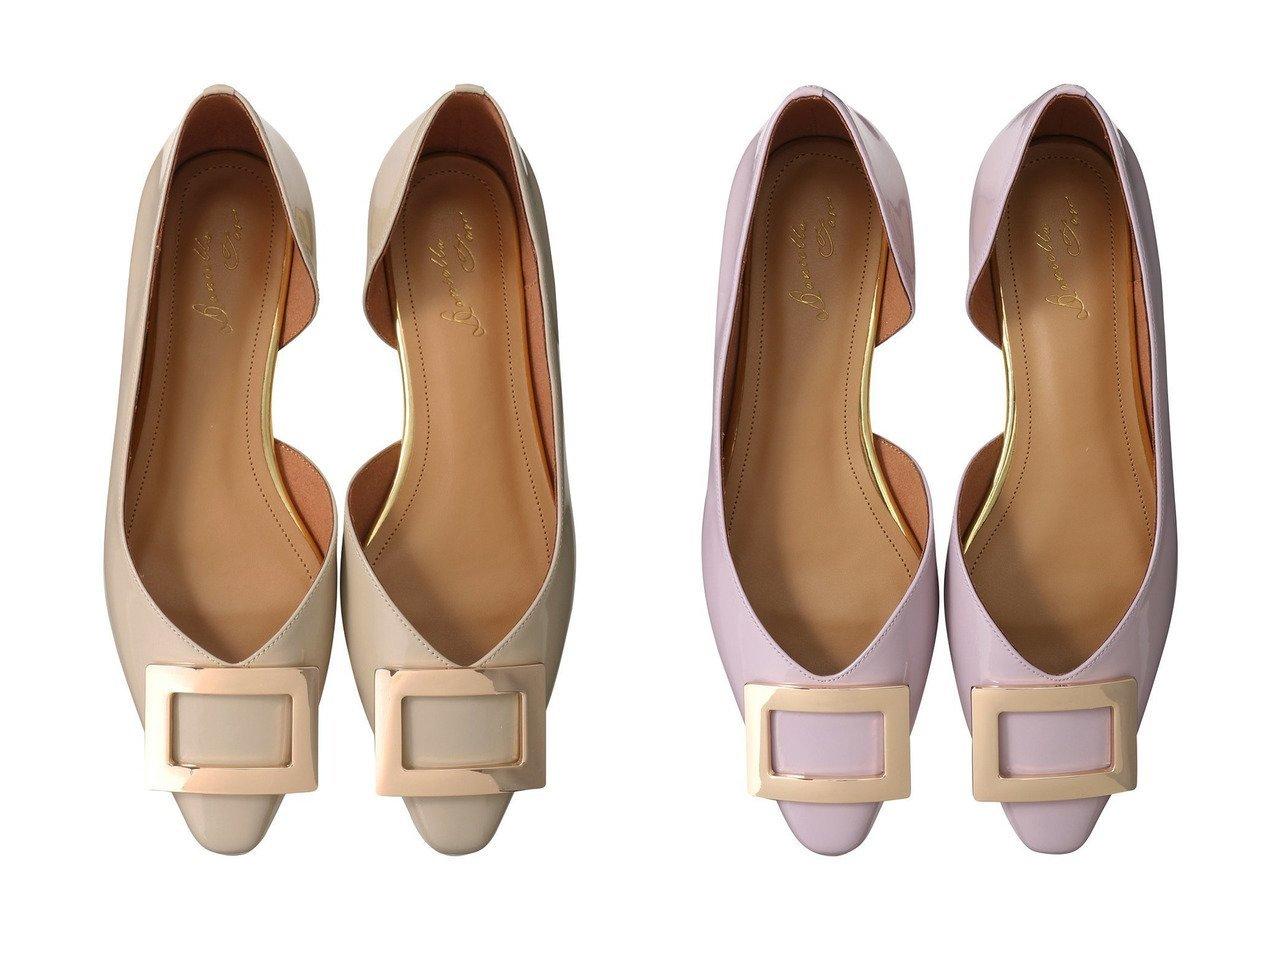 【Daniella & GEMMA/ダニエラ アンド ジェマ】のモチーフフラットパンプス 【シューズ・靴】おすすめ!人気、トレンド・レディースファッションの通販 おすすめで人気の流行・トレンド、ファッションの通販商品 メンズファッション・キッズファッション・インテリア・家具・レディースファッション・服の通販 founy(ファニー) https://founy.com/ ファッション Fashion レディースファッション WOMEN 2021年 2021 2021春夏・S/S SS/Spring/Summer/2021 S/S・春夏 SS・Spring/Summer シューズ フォルム フラット リュクス 春 Spring |ID:crp329100000027845